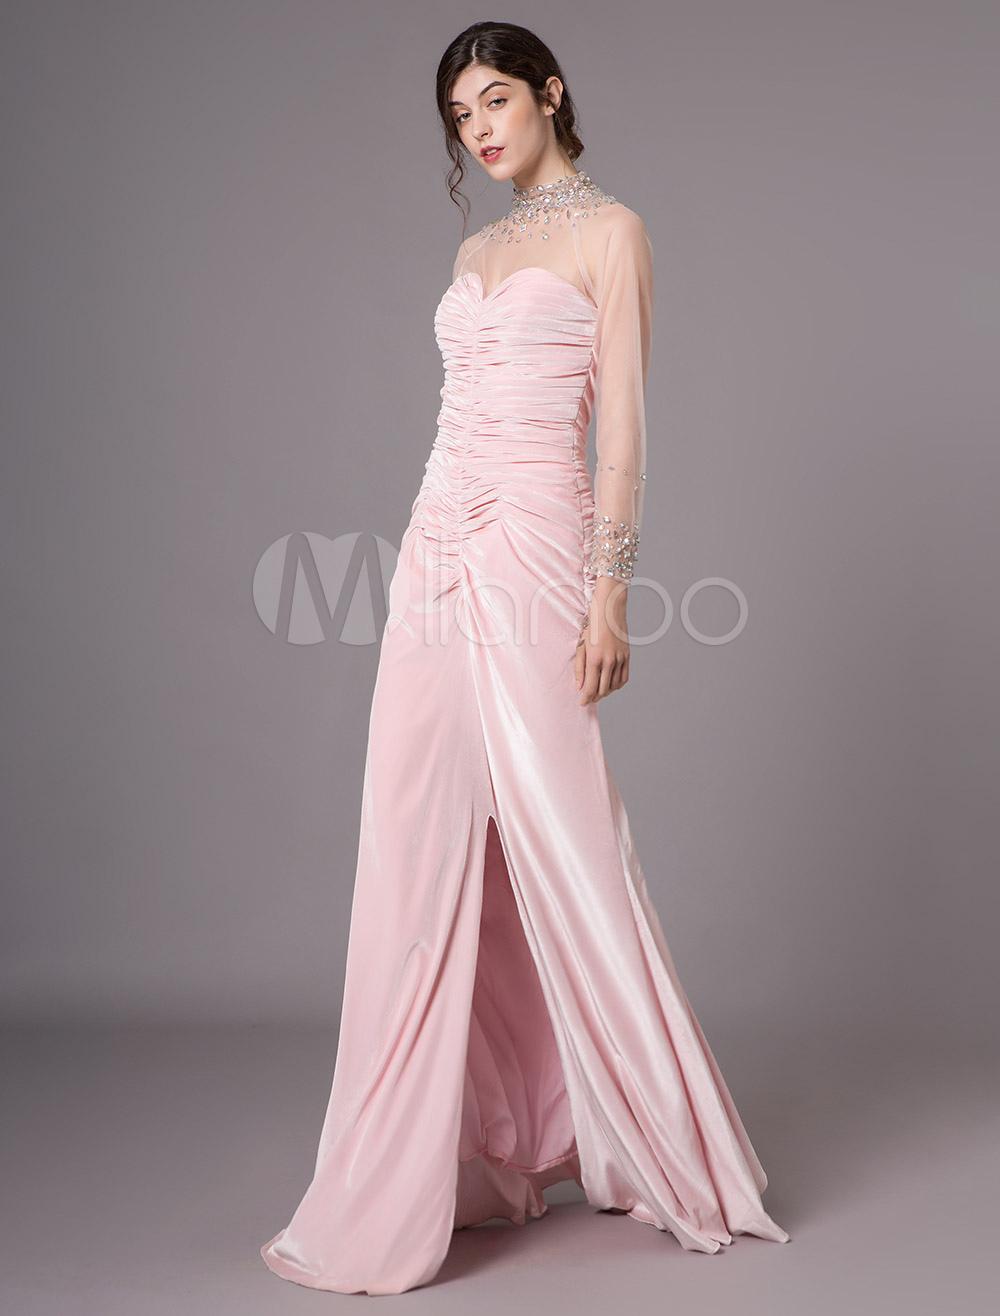 Evening Dresses Winter Long Sleeve High Collar Velvet Soft Pink Prom